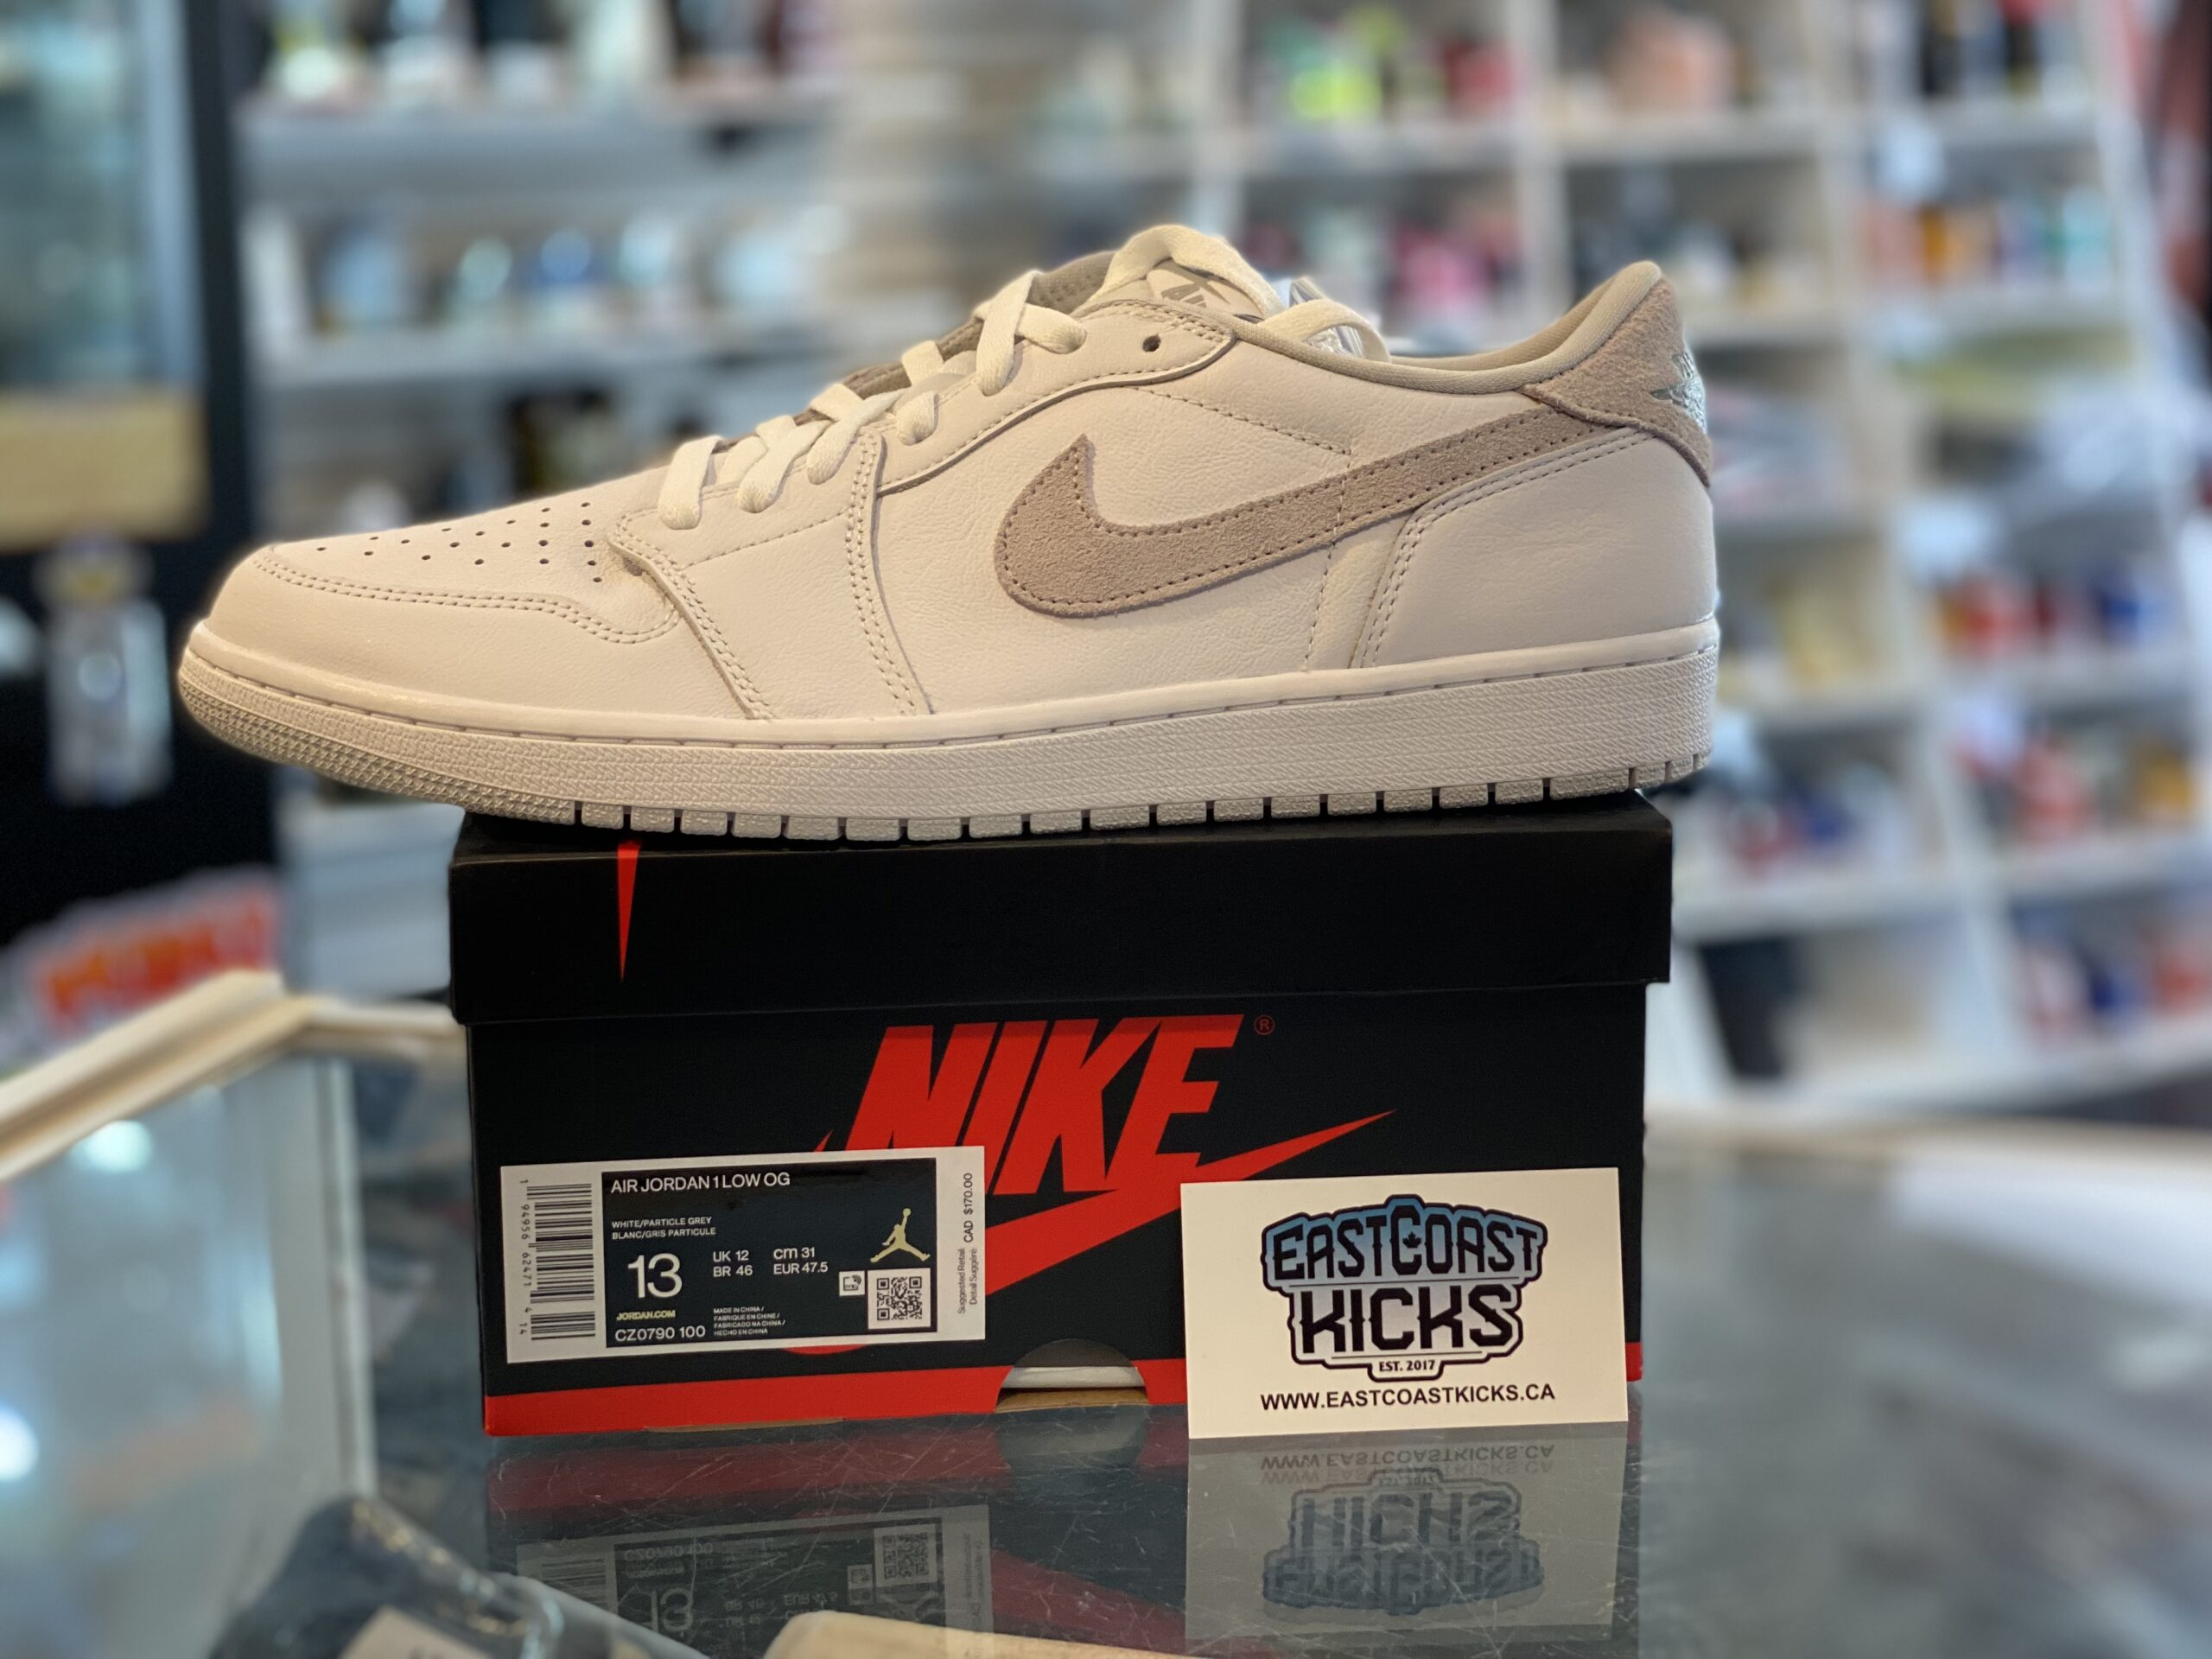 Jordan 1 Low Neutral Grey Size 13